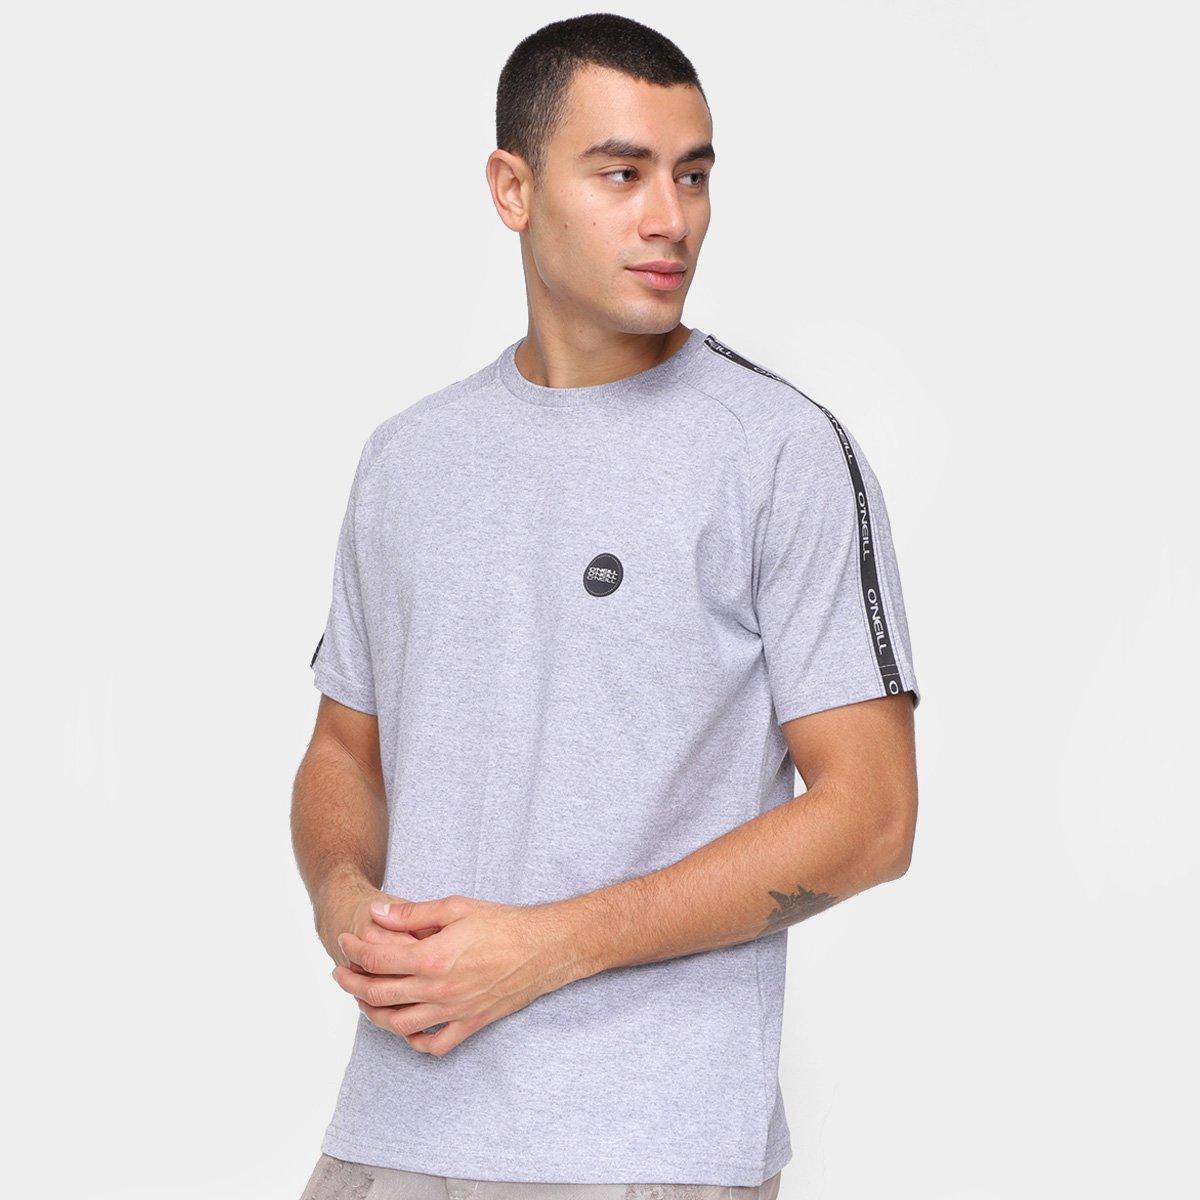 Camiseta O'Neill Raglan Masculina